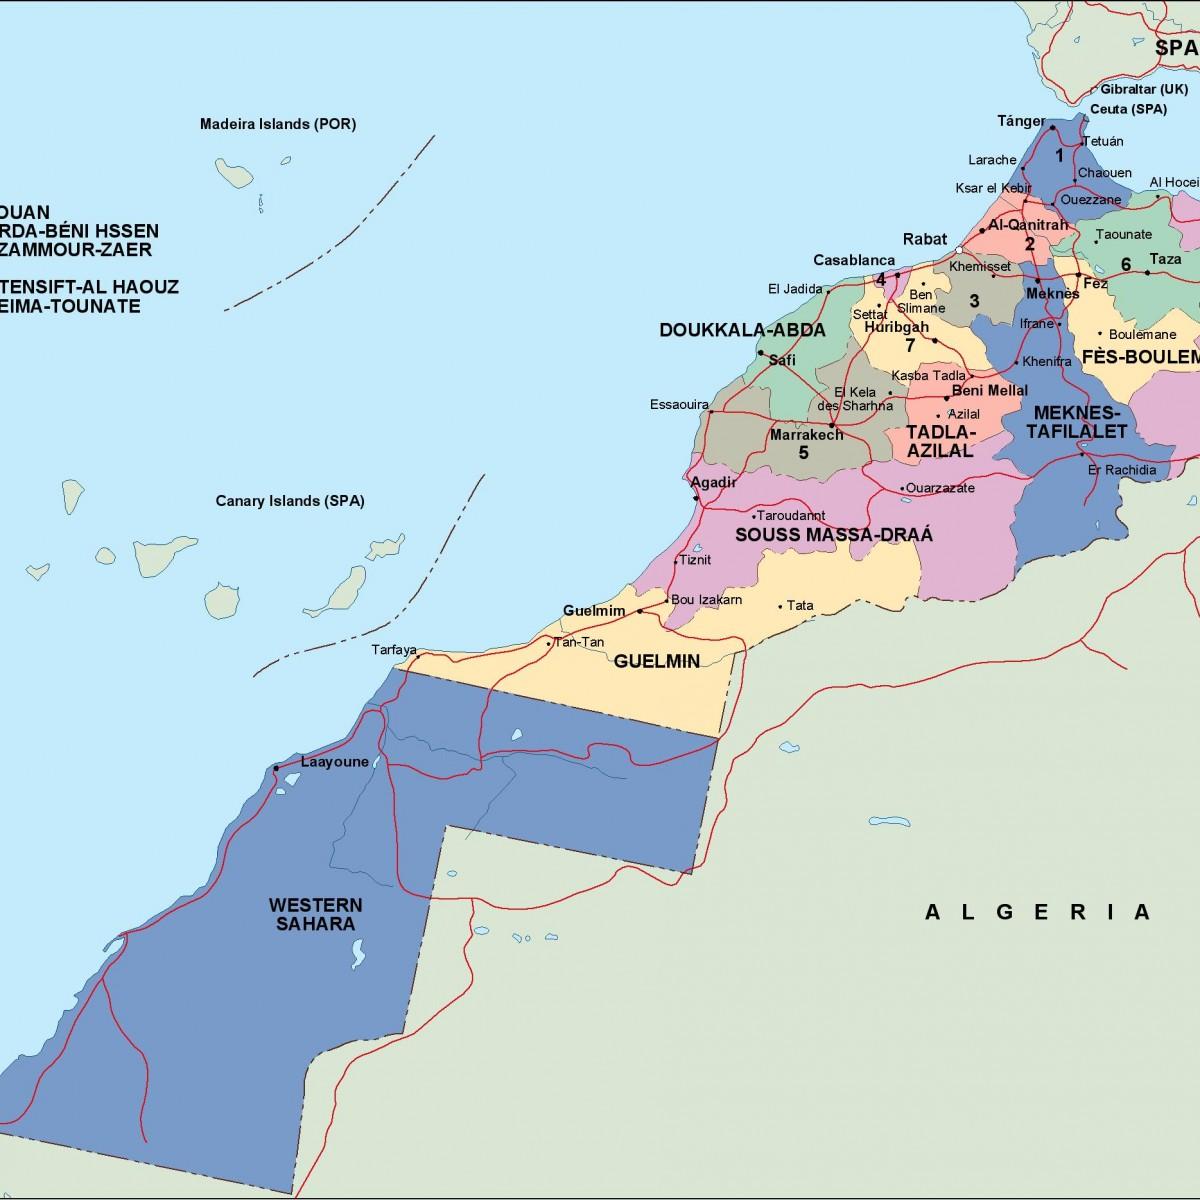 morocco political map on saudi arabia map, angola map, ghana map, egypt map, europe map, sierra leone map, algeria map, mali map, mexico map, malawi map, cameroon map, mauritania map, liberia map, senegal map, moldova map, chad map, italy map, nigeria map, brazil map, japan map, spain map, kenya map, india map, iraq map, rwanda map, lesotho map, israel map, south africa map, eritrea map, mauritius map, namibia map, tunisia map, mozambique map, poland map, libya map, france map, western hemisphere map, niger map,